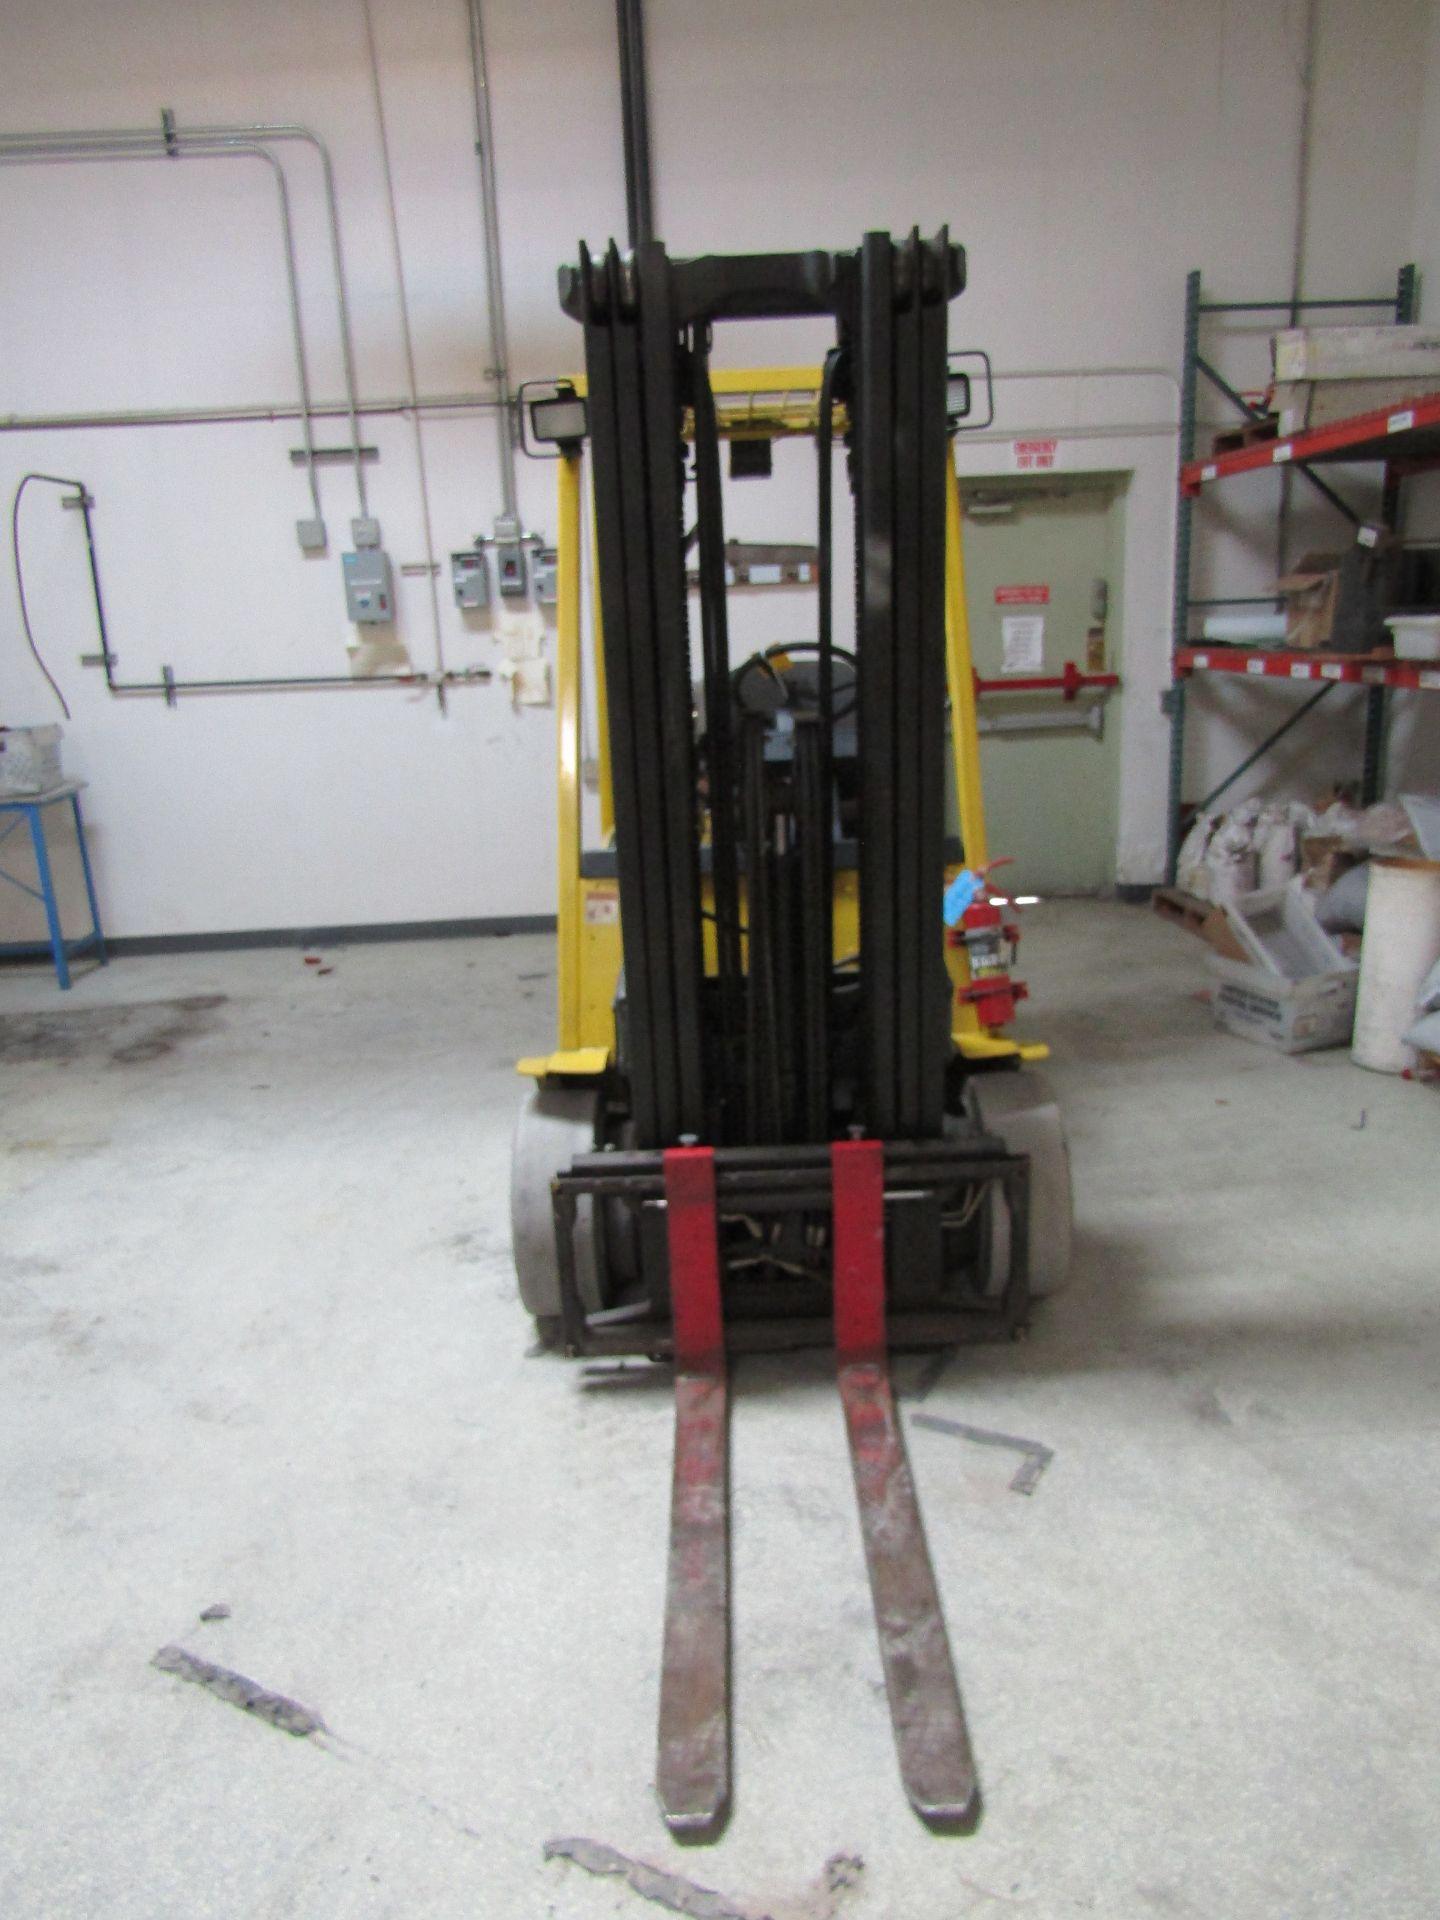 Lot 22 - HYSTER S50XM Forklift, 3 Mast, Side Shift, Serial D187U256982, 4,400 LB Cap, Weight 8970 LB, Front